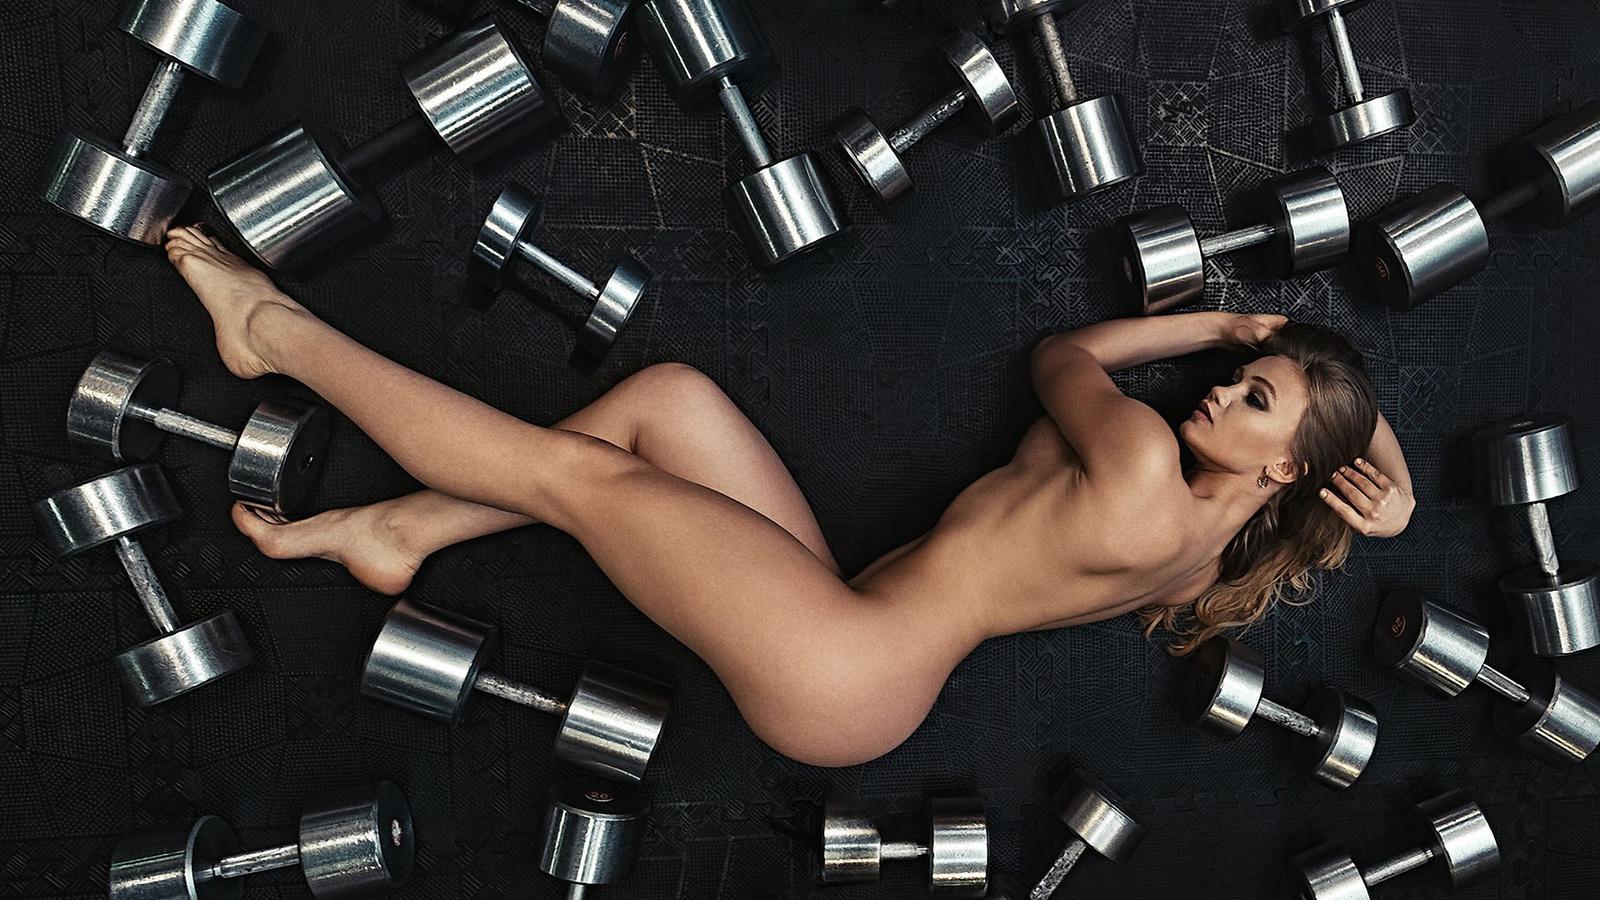 women, top view, nude, ass, dumbbells, tanned, blonde, on the floor, boobs, гантели, девушка, вид сверху, обнаженная, попка, на полу